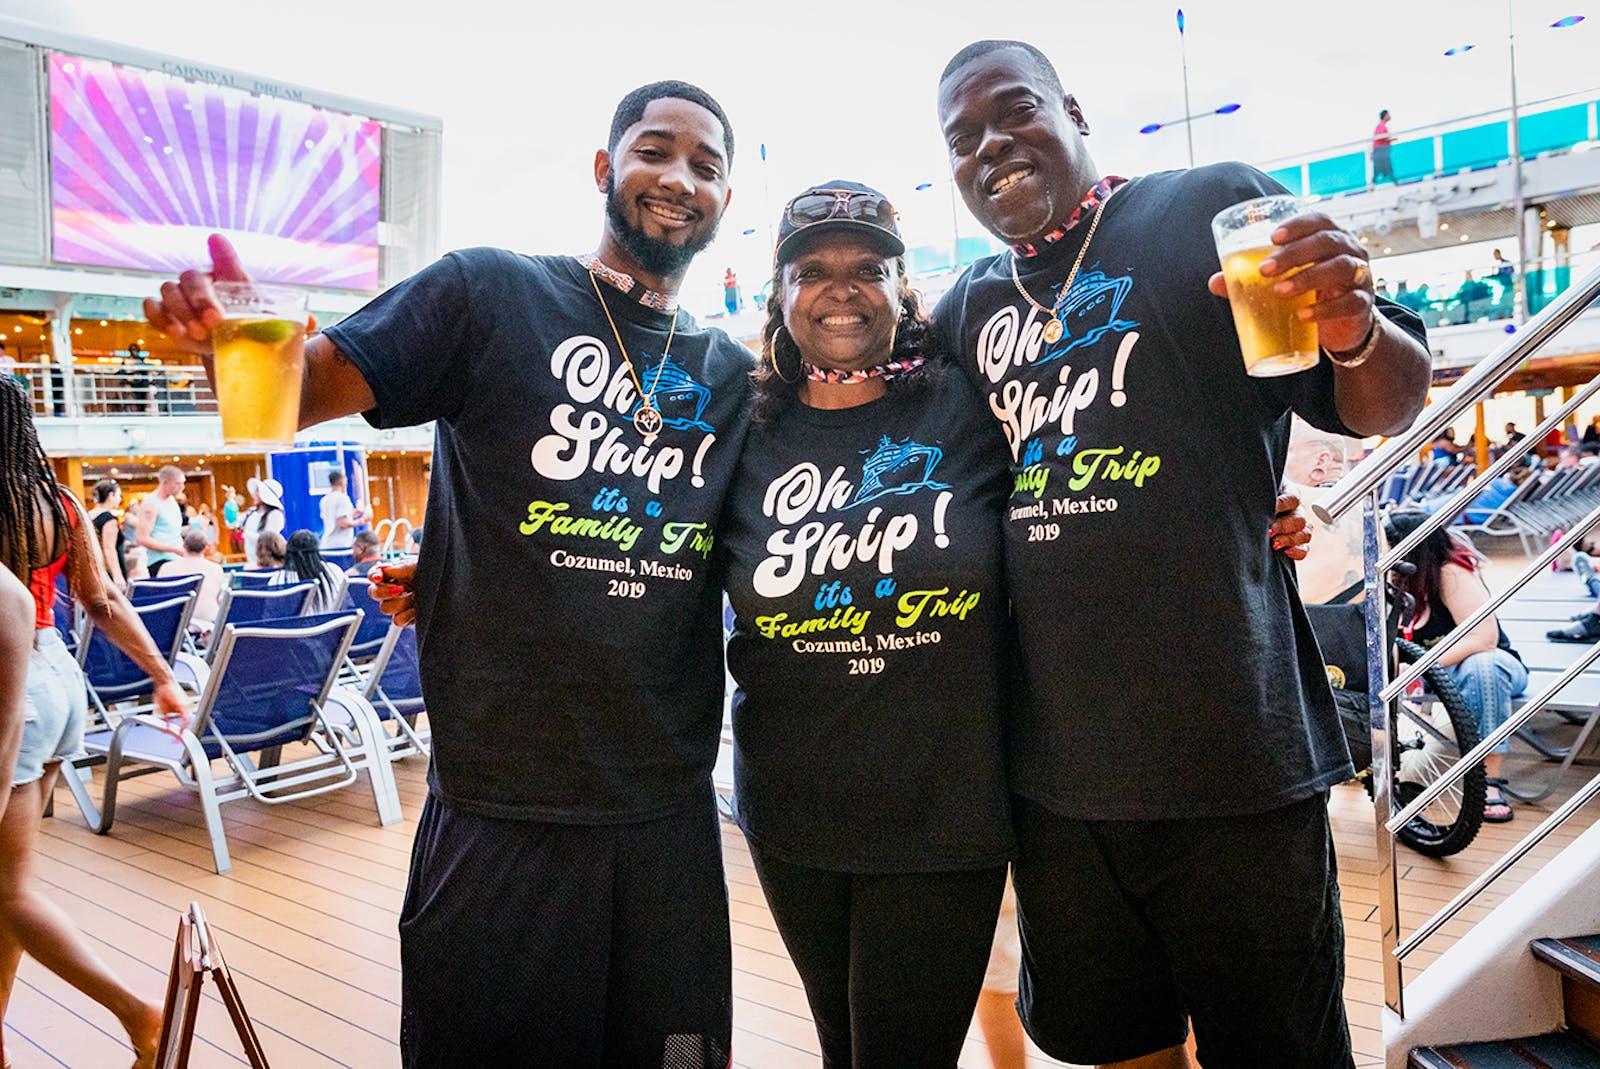 Carnival cruise t-shirts